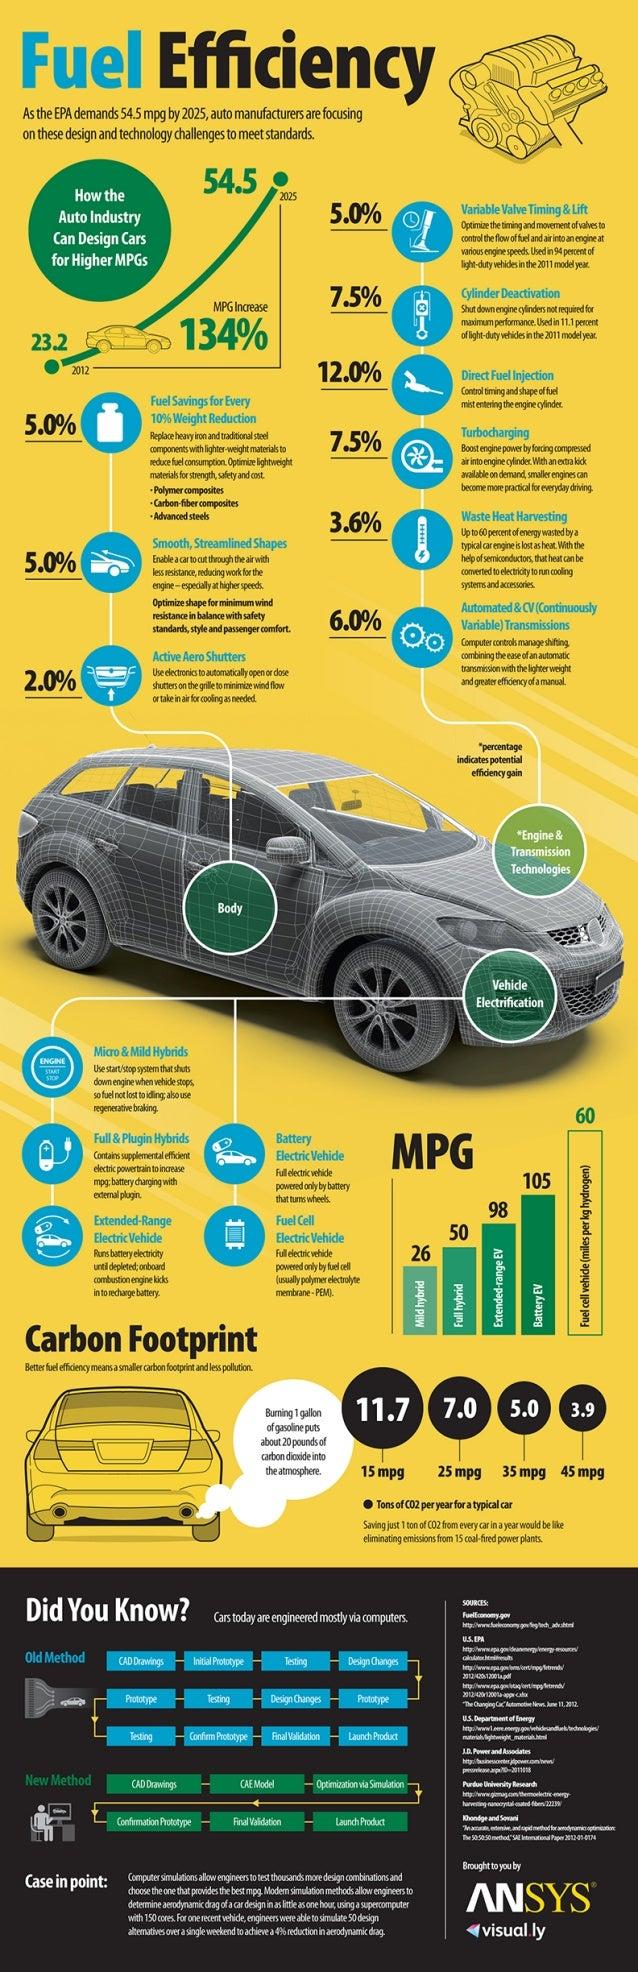 Fuel Efficiency 54.4 mpg by 2025